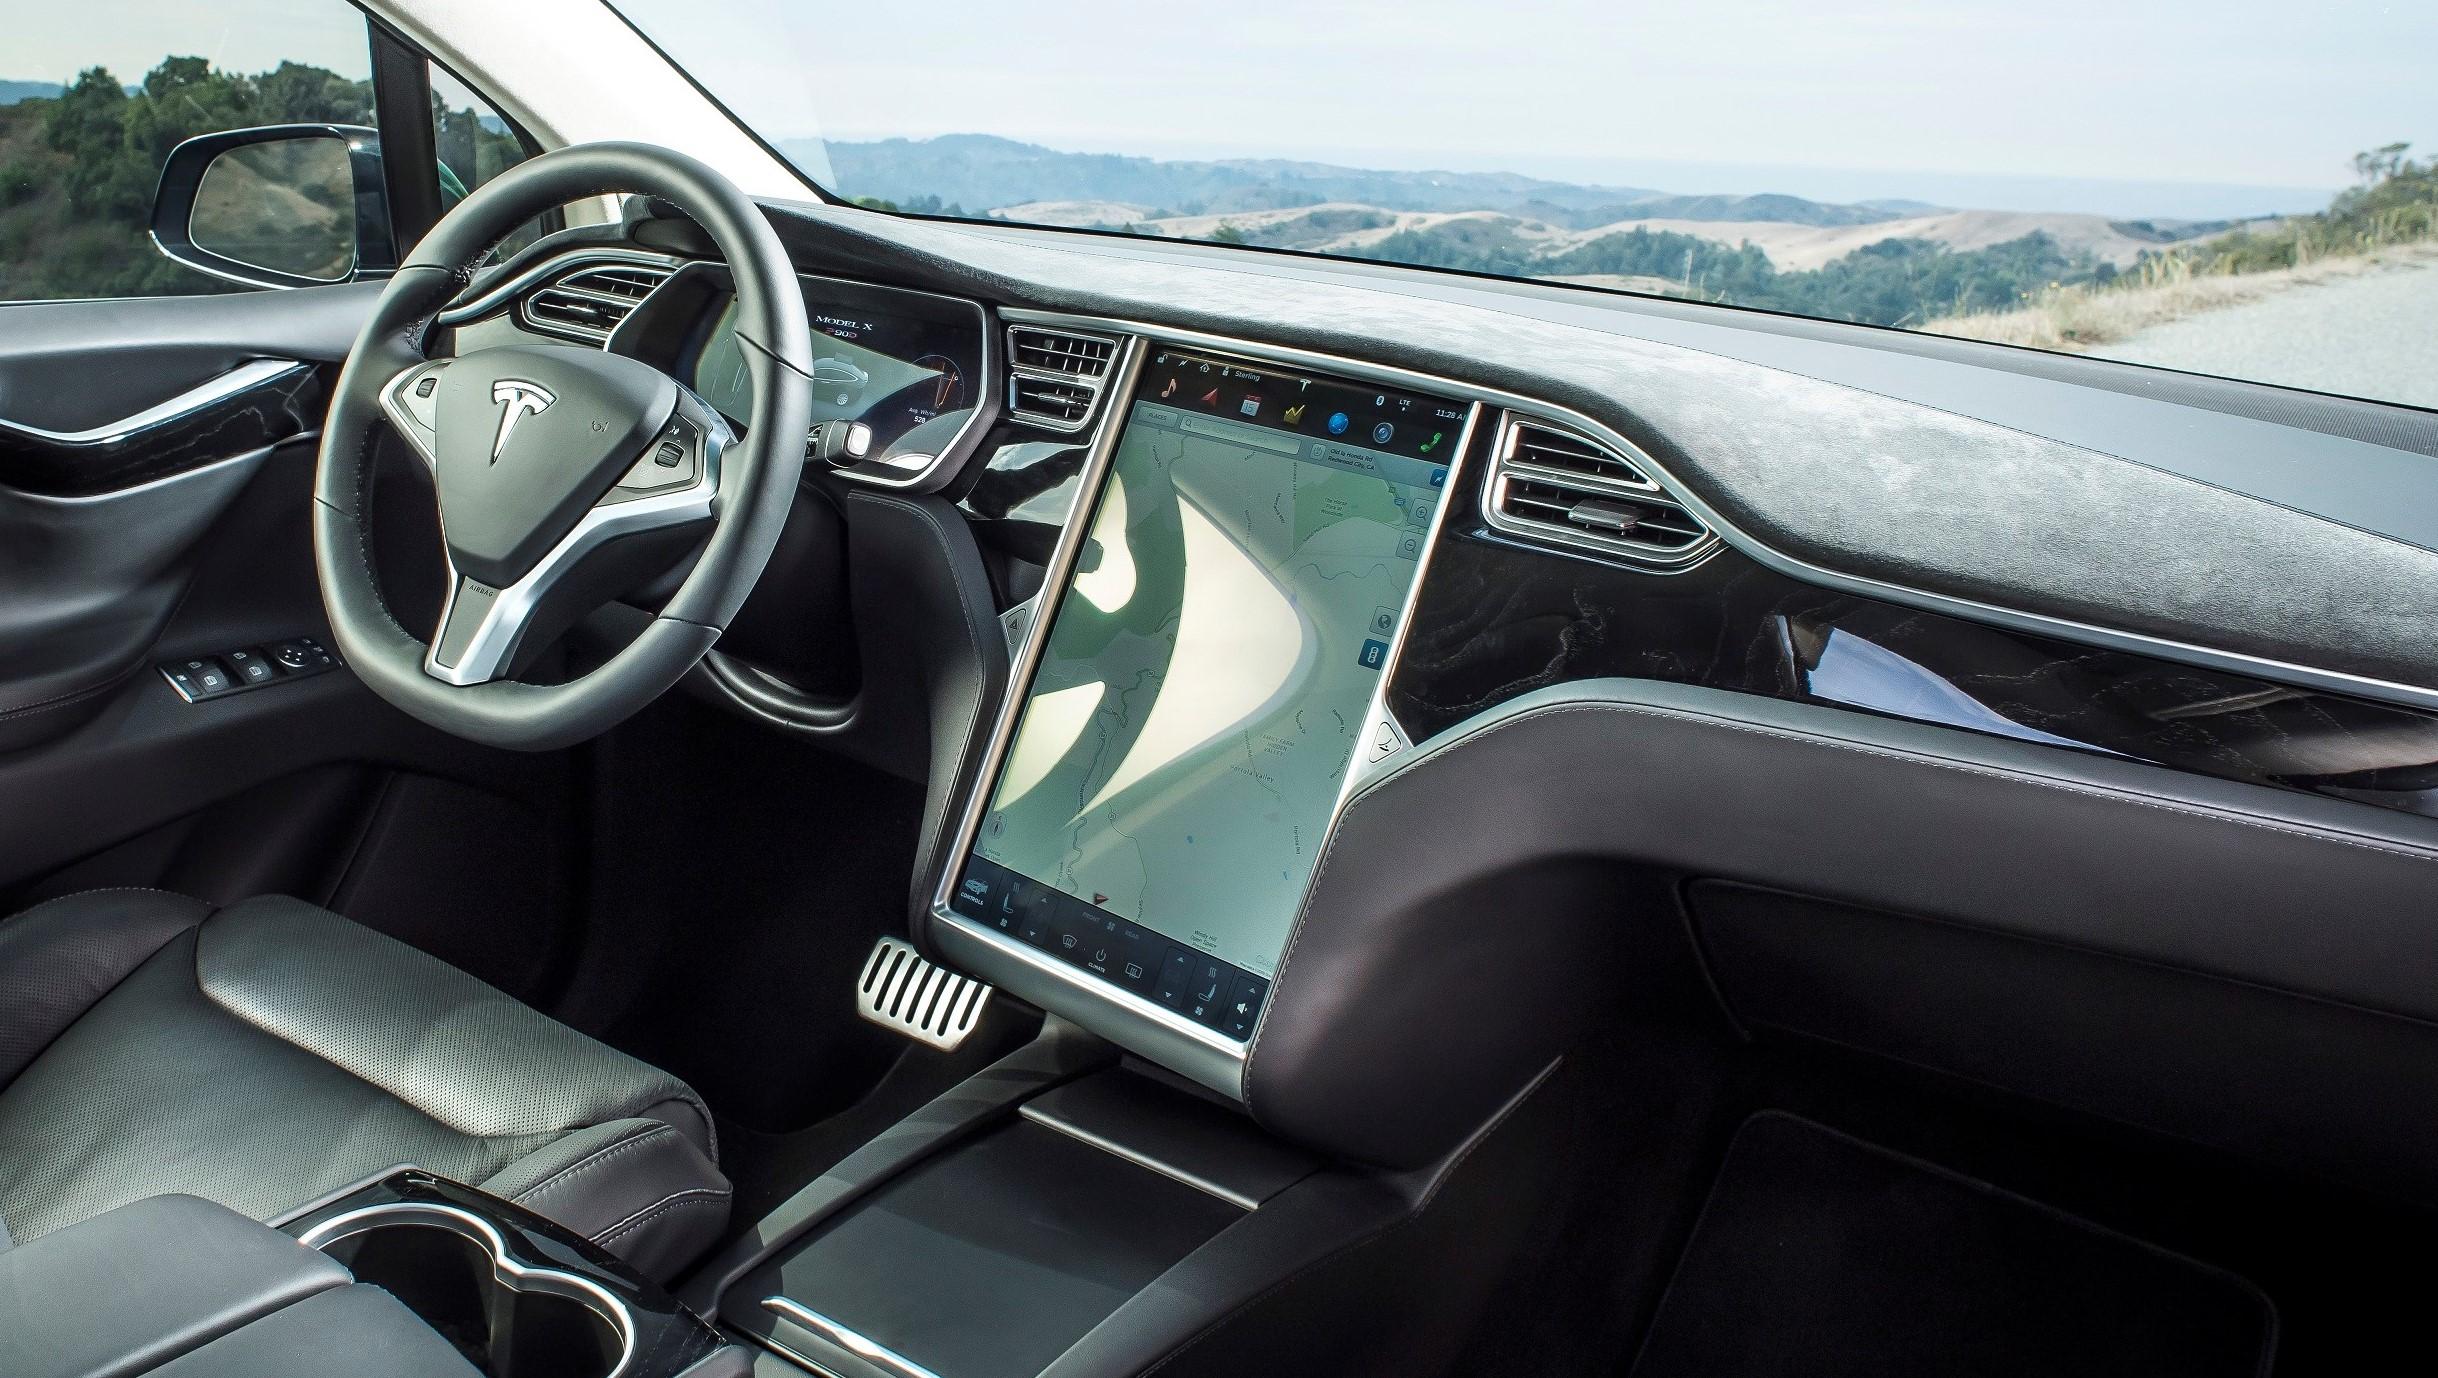 Se de første bildene: Slik blir Tesla version 9.